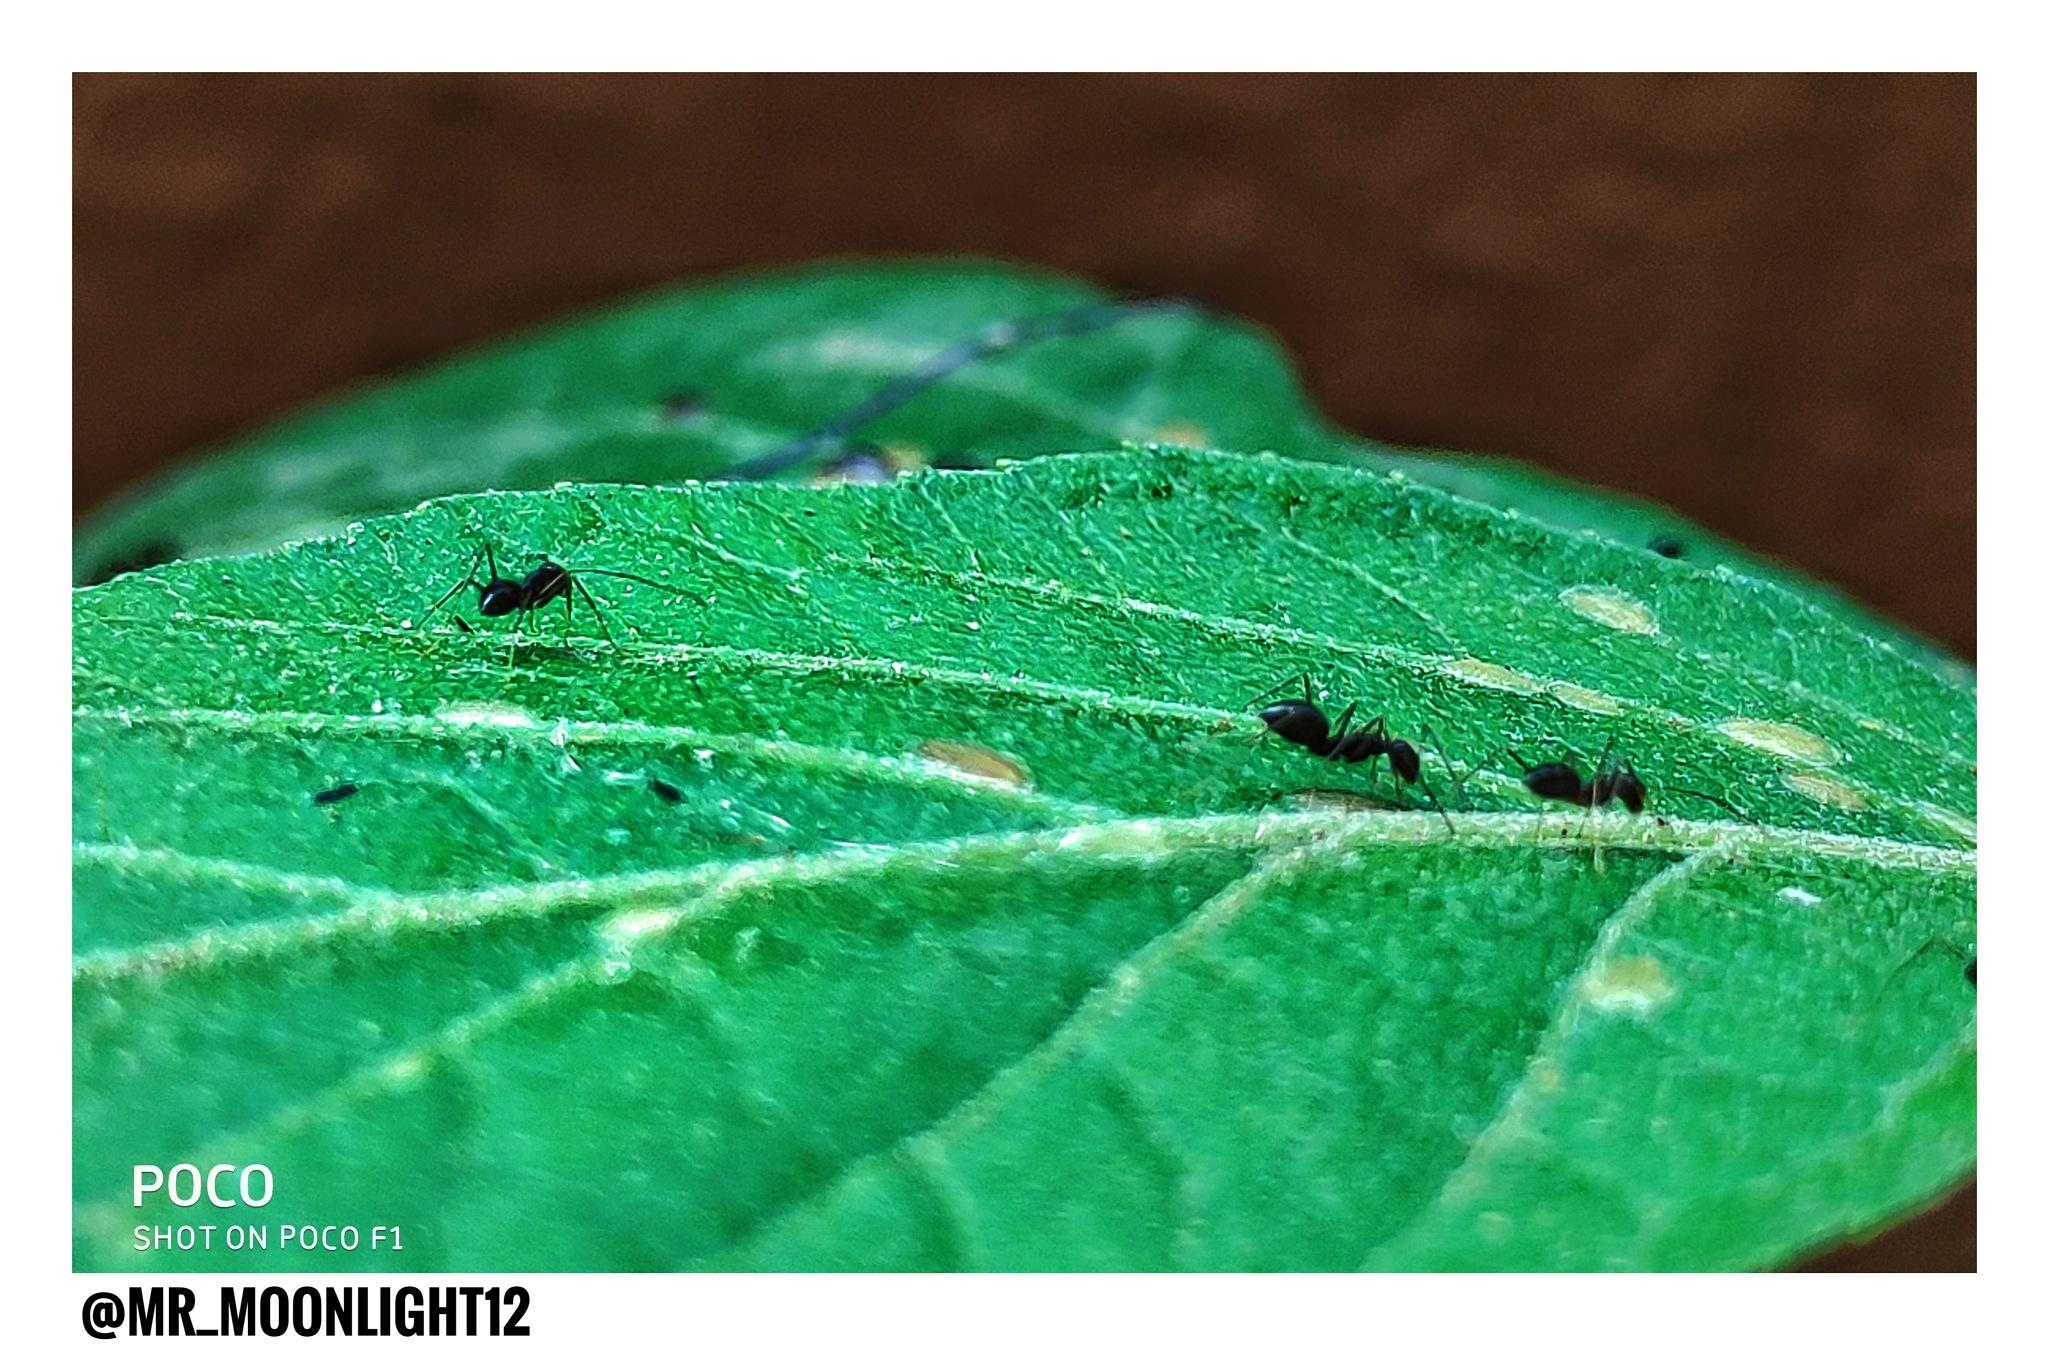 Untitled by Chandraprakash vishwakarma